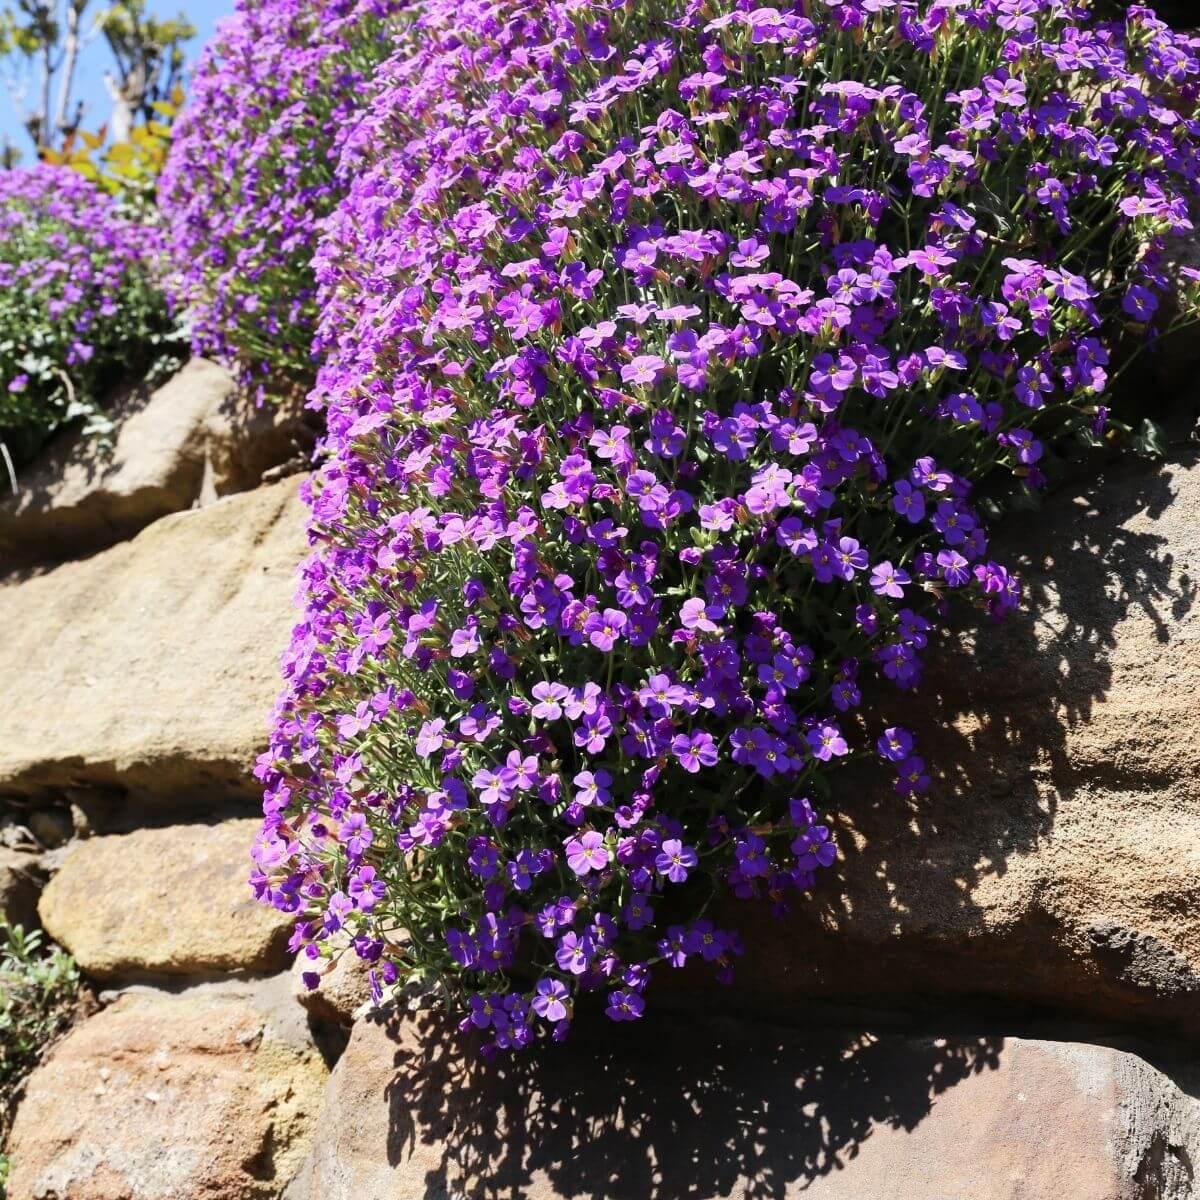 Rock Cress flowering in a rock garden.